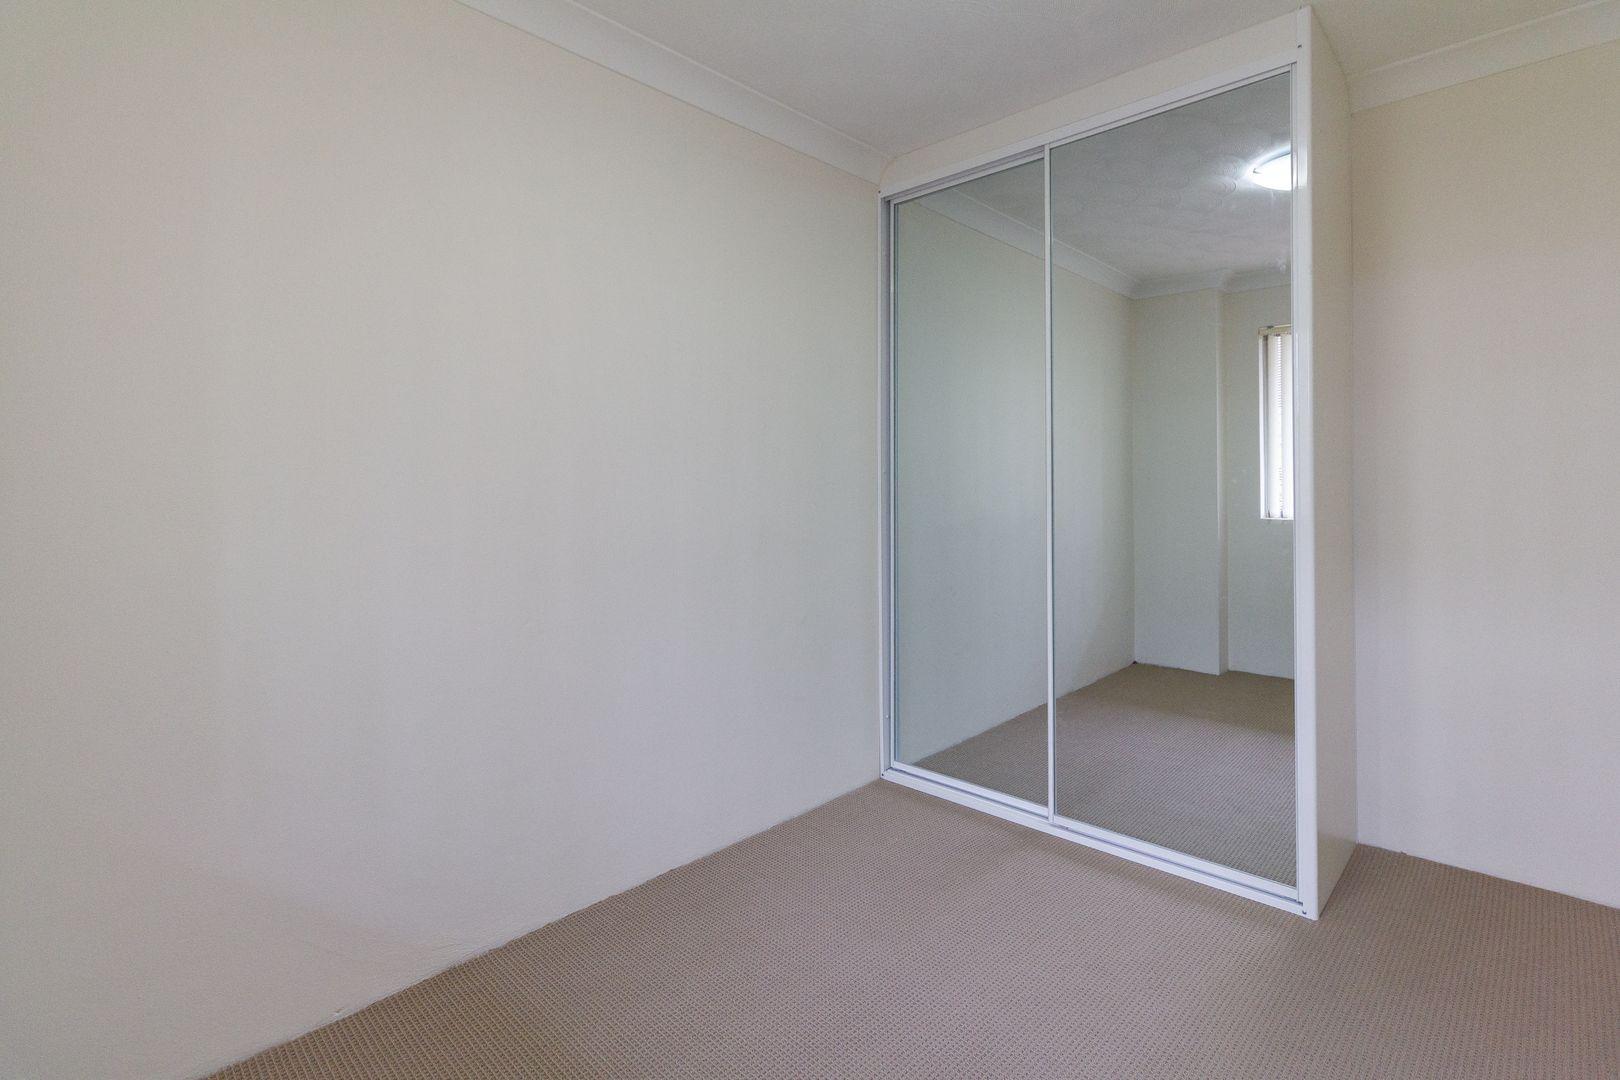 12/128 Macquarie Street, Parramatta NSW 2150, Image 1